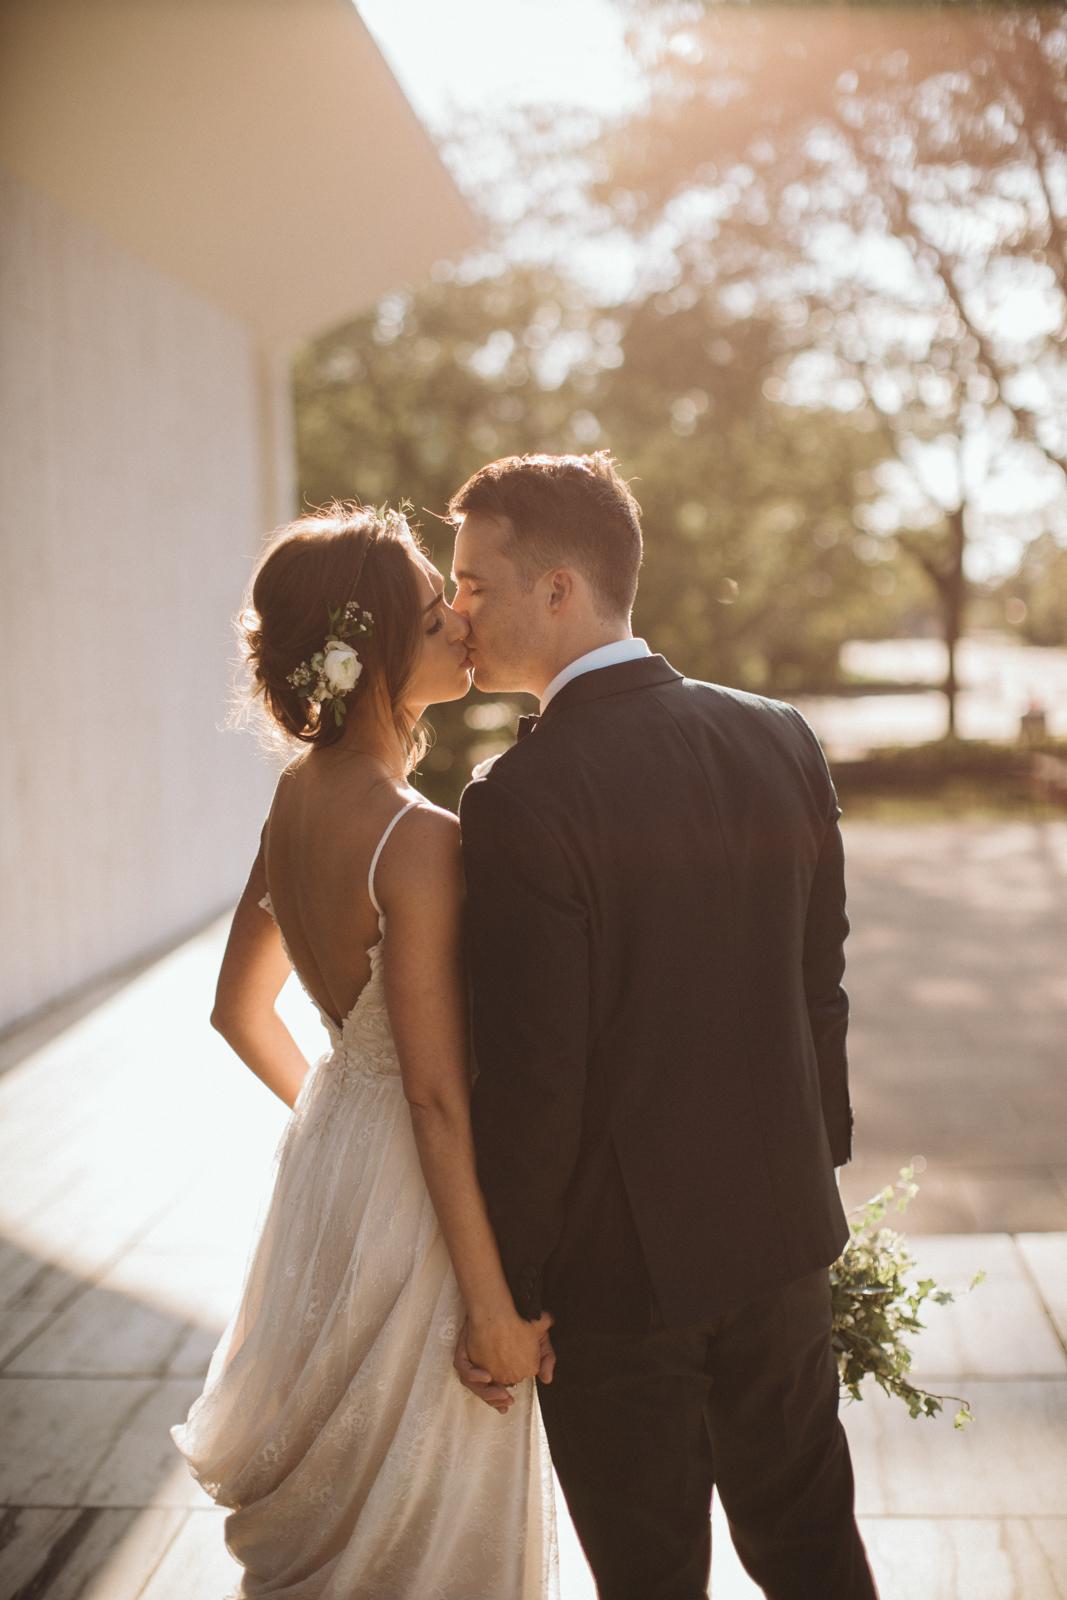 BeanandCole.com-Chris&JackieJohnson-Wedding-166.jpg